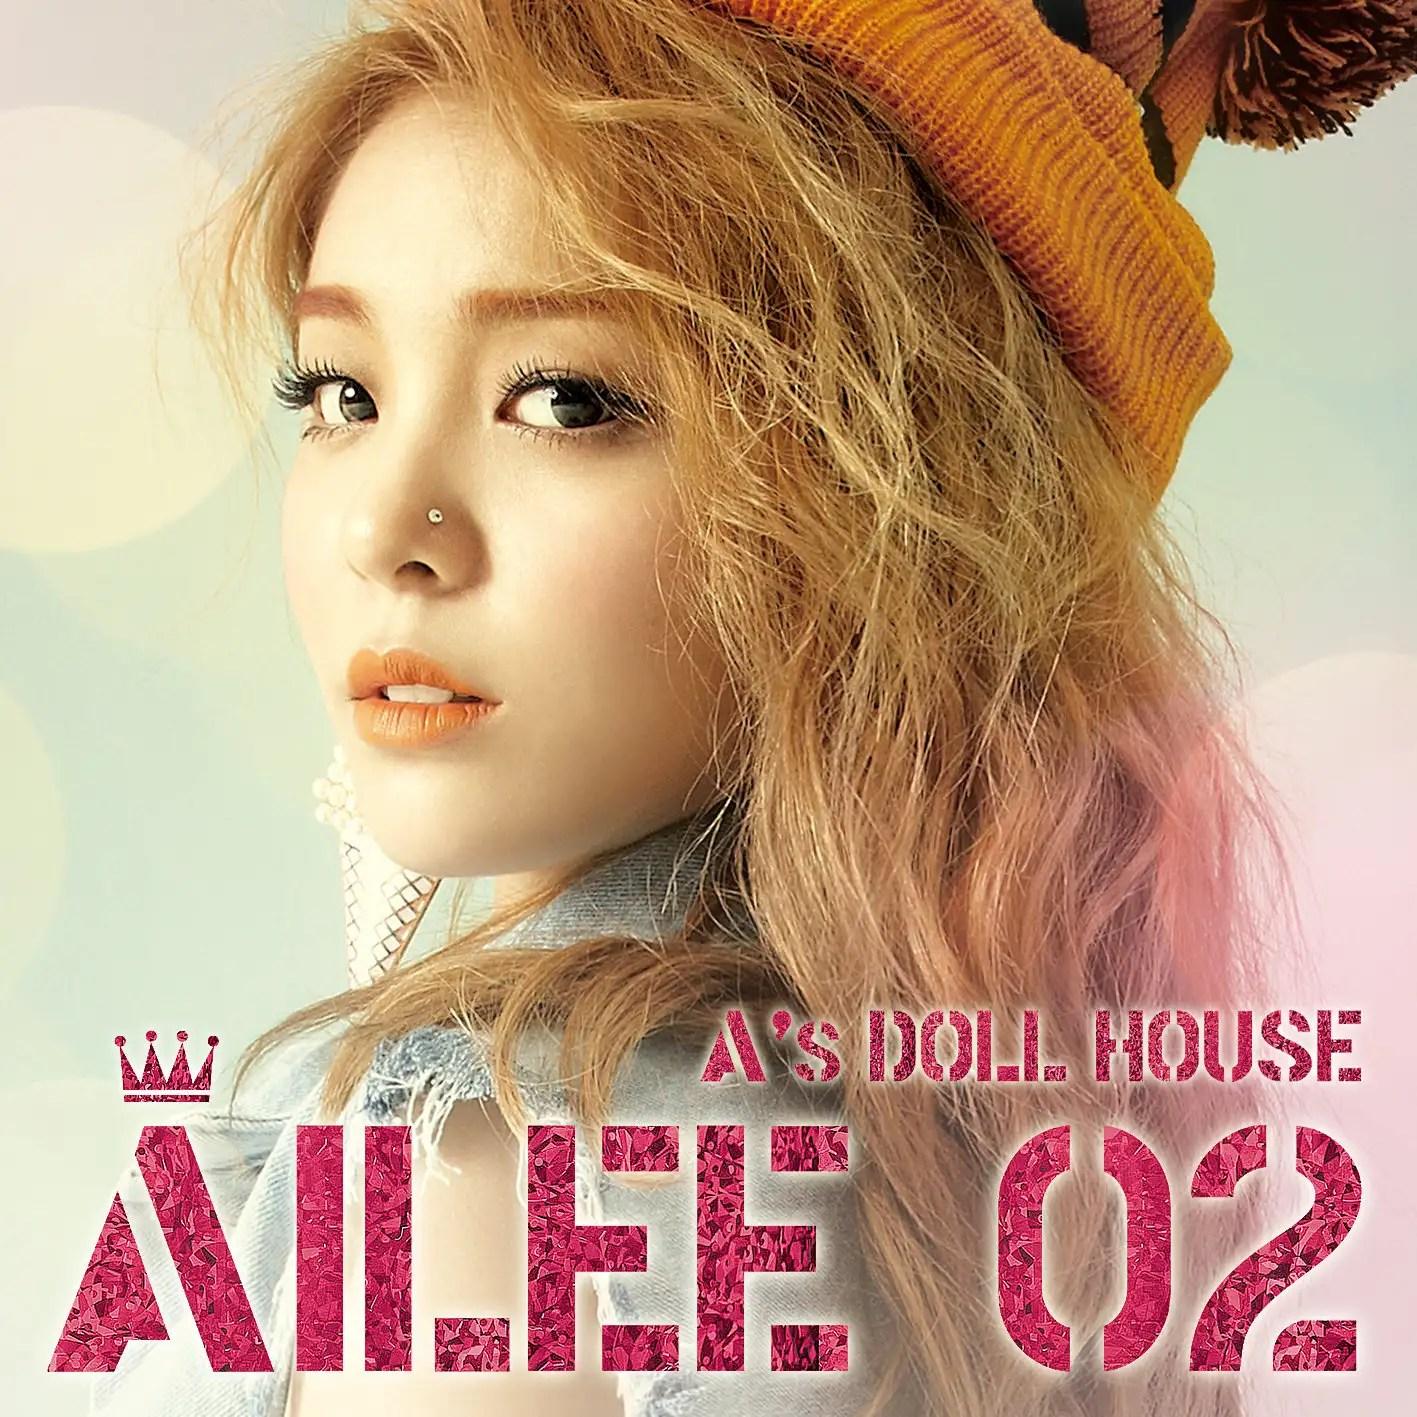 [Mini Album] Ailee - A's Doll House [2nd Mini Album]